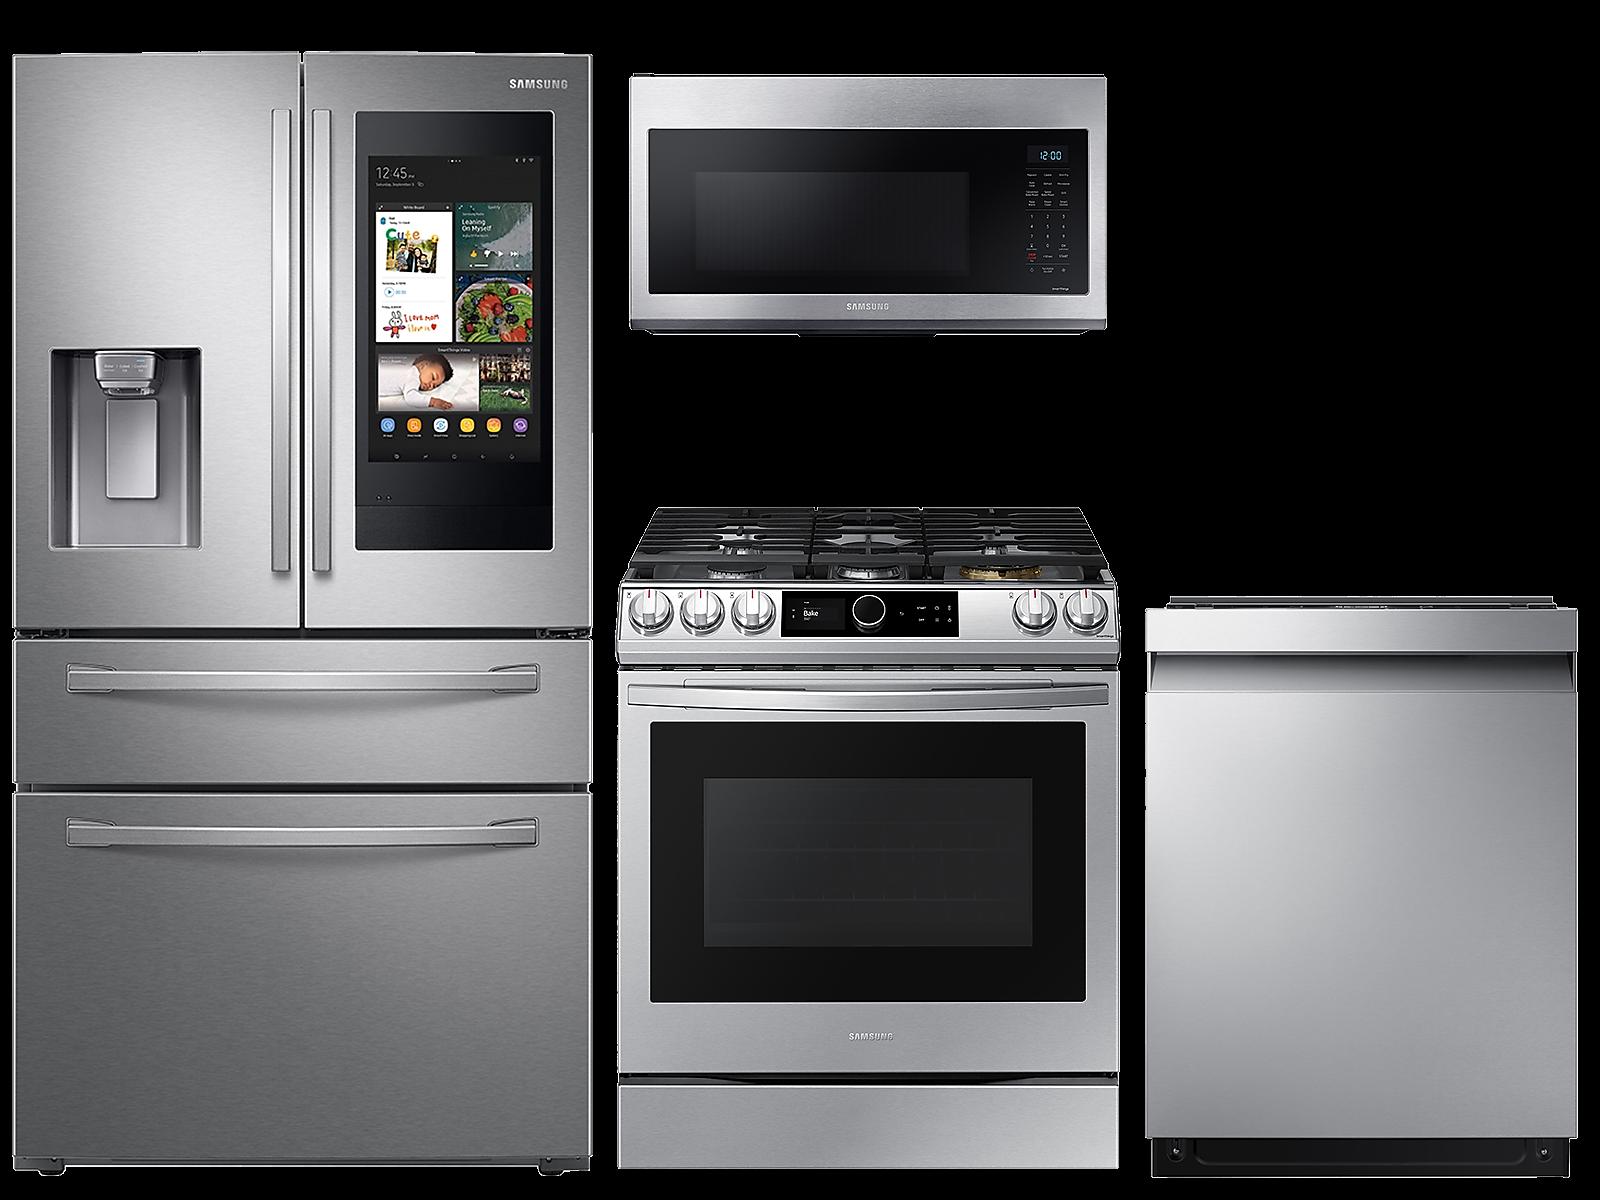 Samsung coupon: Samsung 22 cu. ft. Family HubTM 4-door refrigerator, 6.0 cu. ft. gas range, microwave and 42 dBA dishwasher package(BNDL-1613504226779)